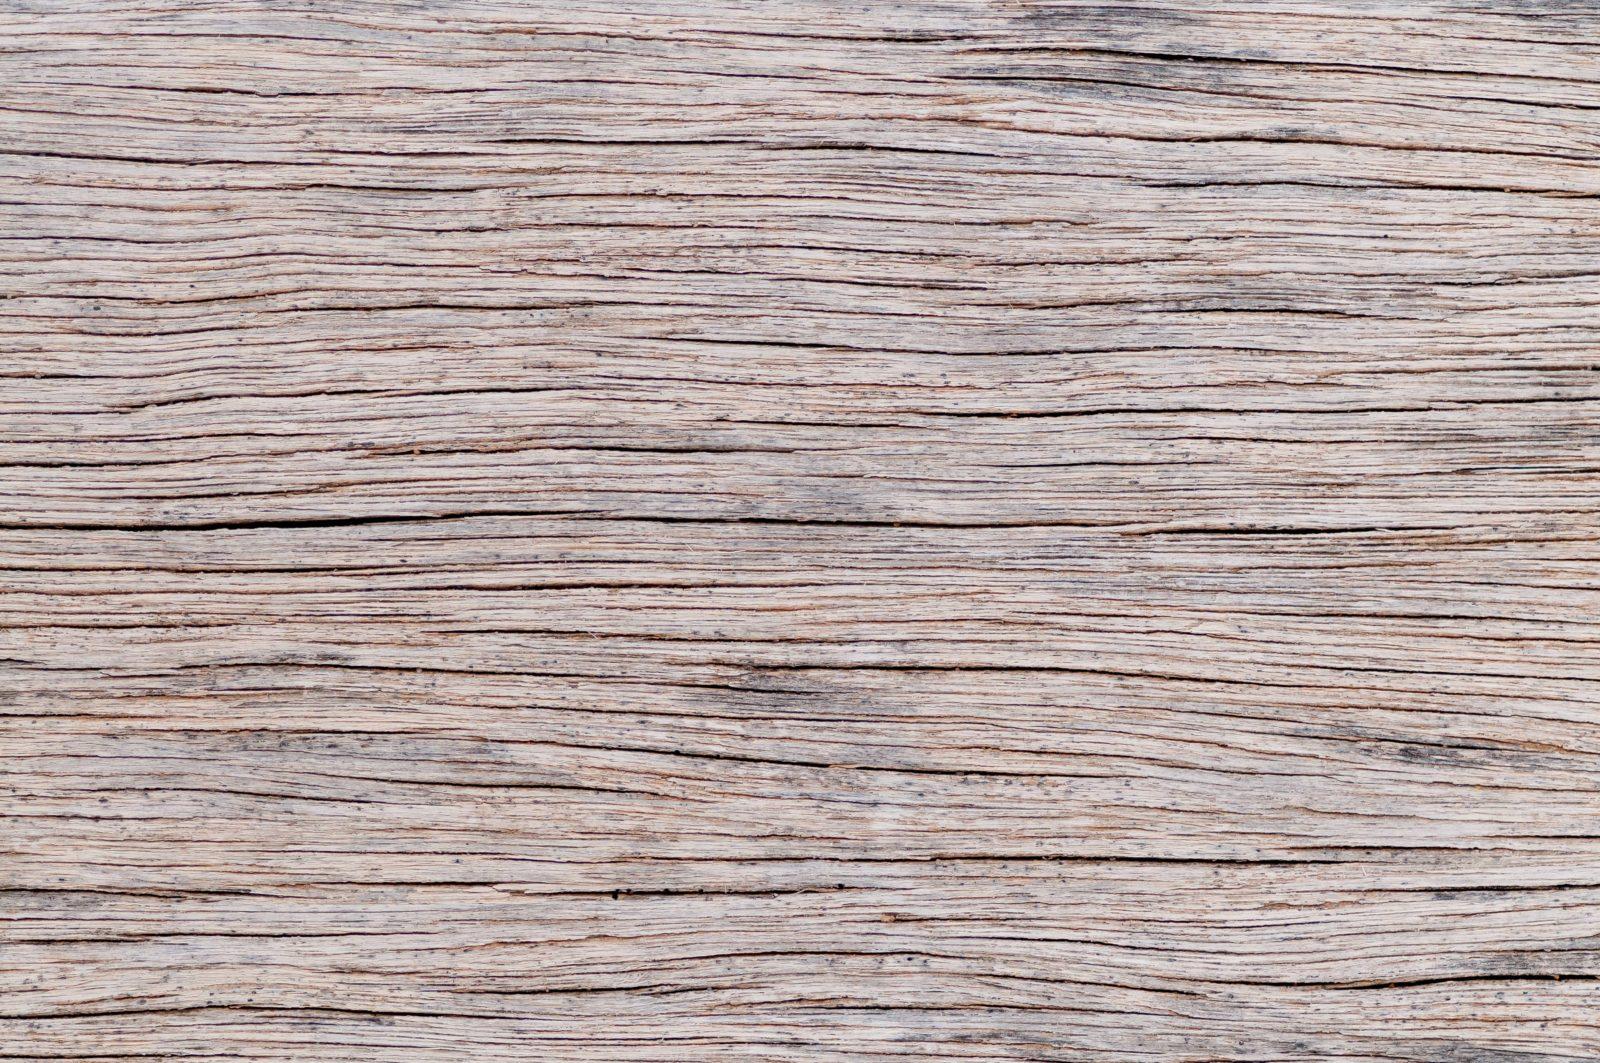 Wood texture bacground horizontal nerves